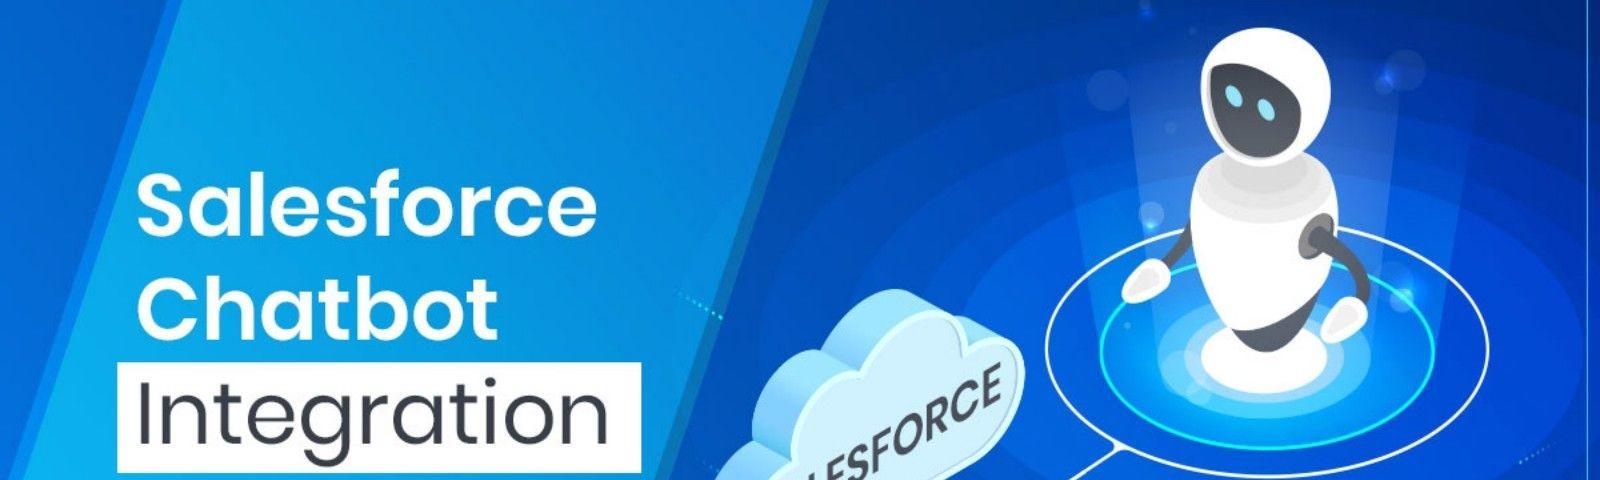 SalesForce Chatbot - SPM Global Technologies